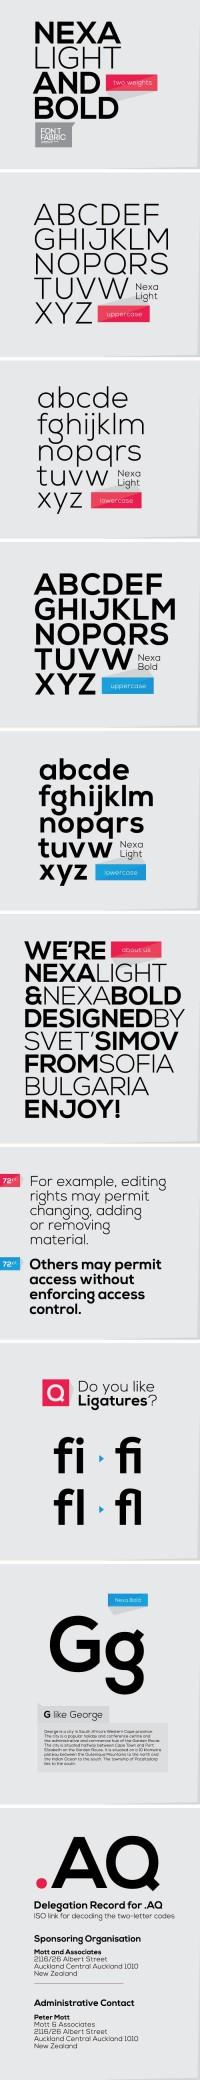 Nexa Free Font - Designer First